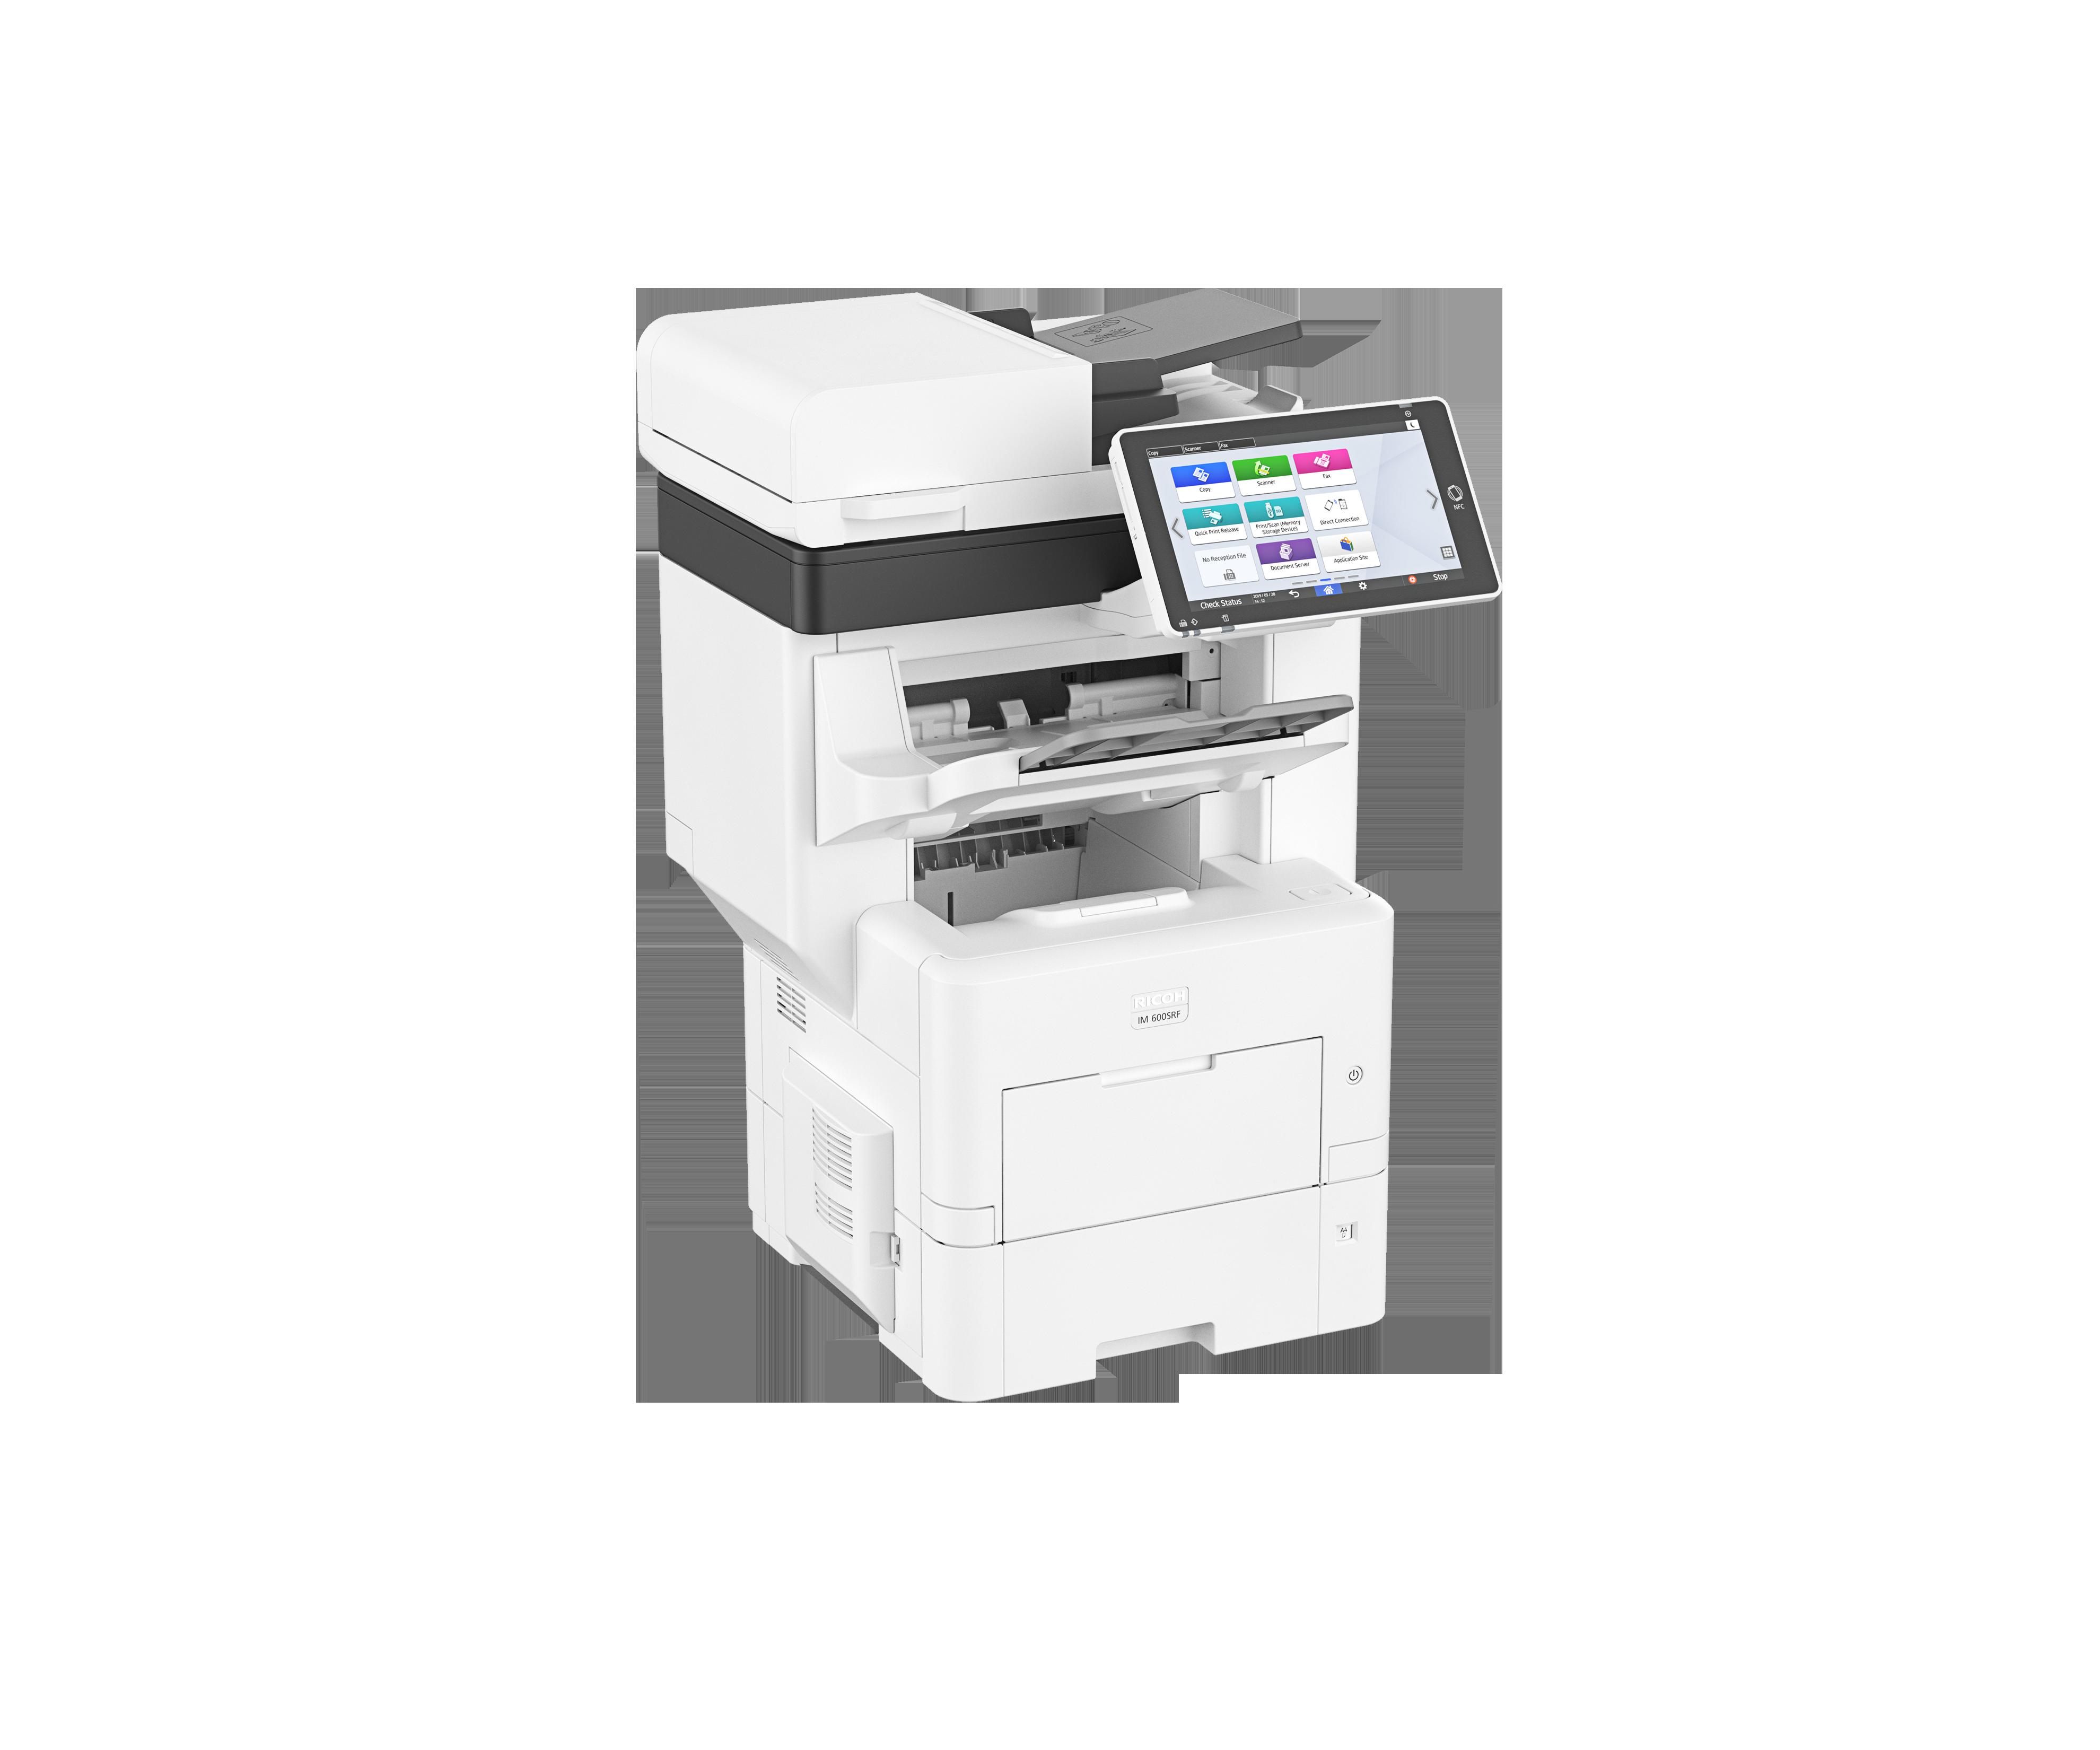 impresora blanco y negro p 802